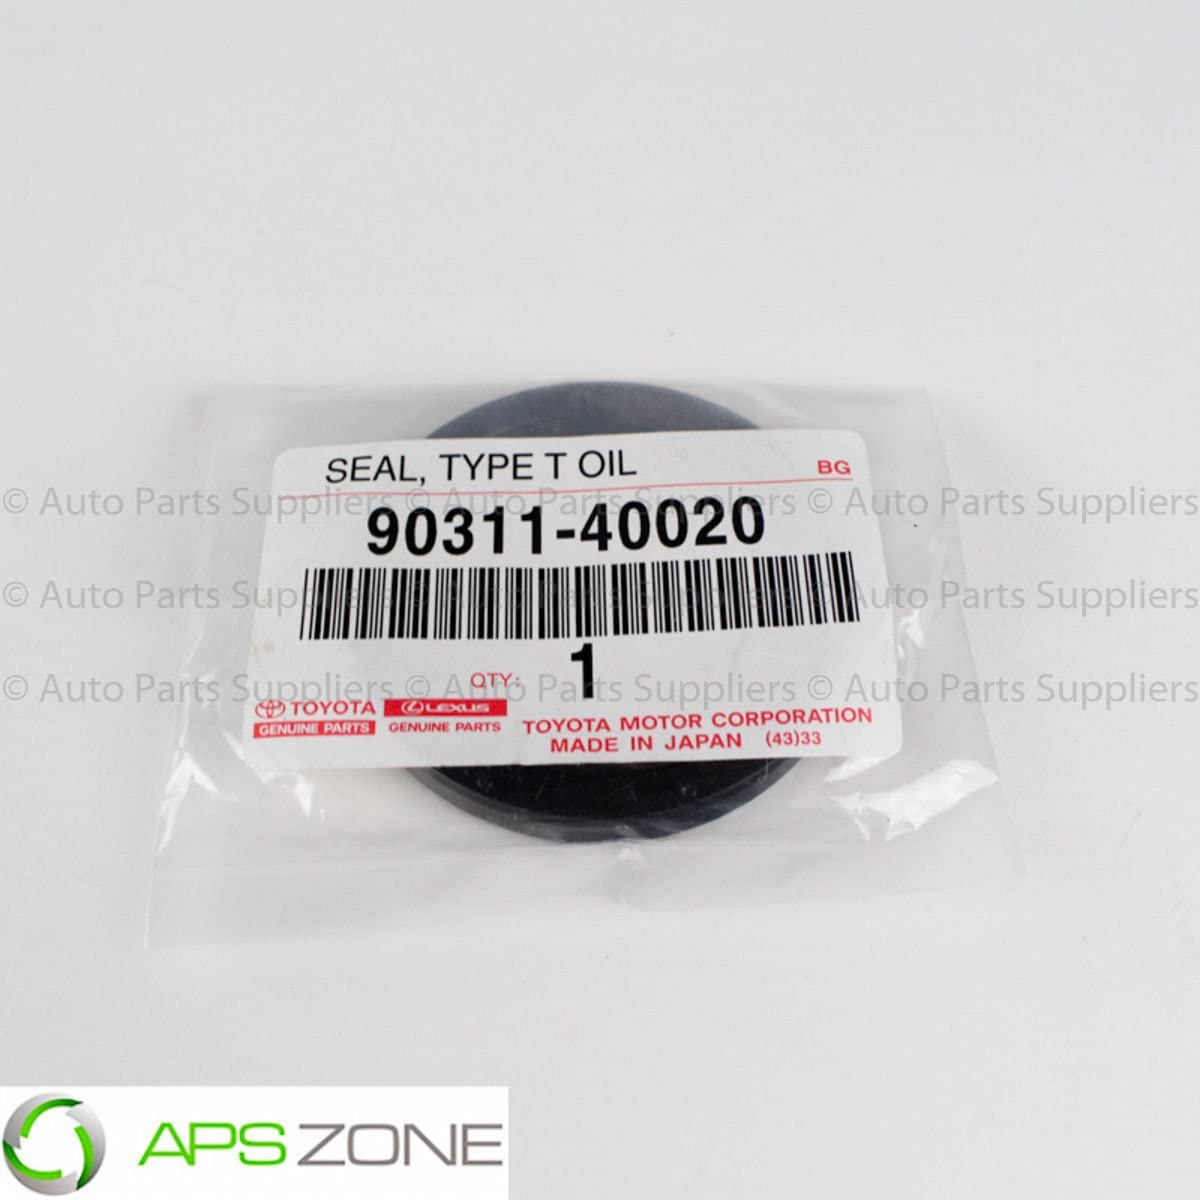 Lexus 90311-40020 Engine Camshaft Seal